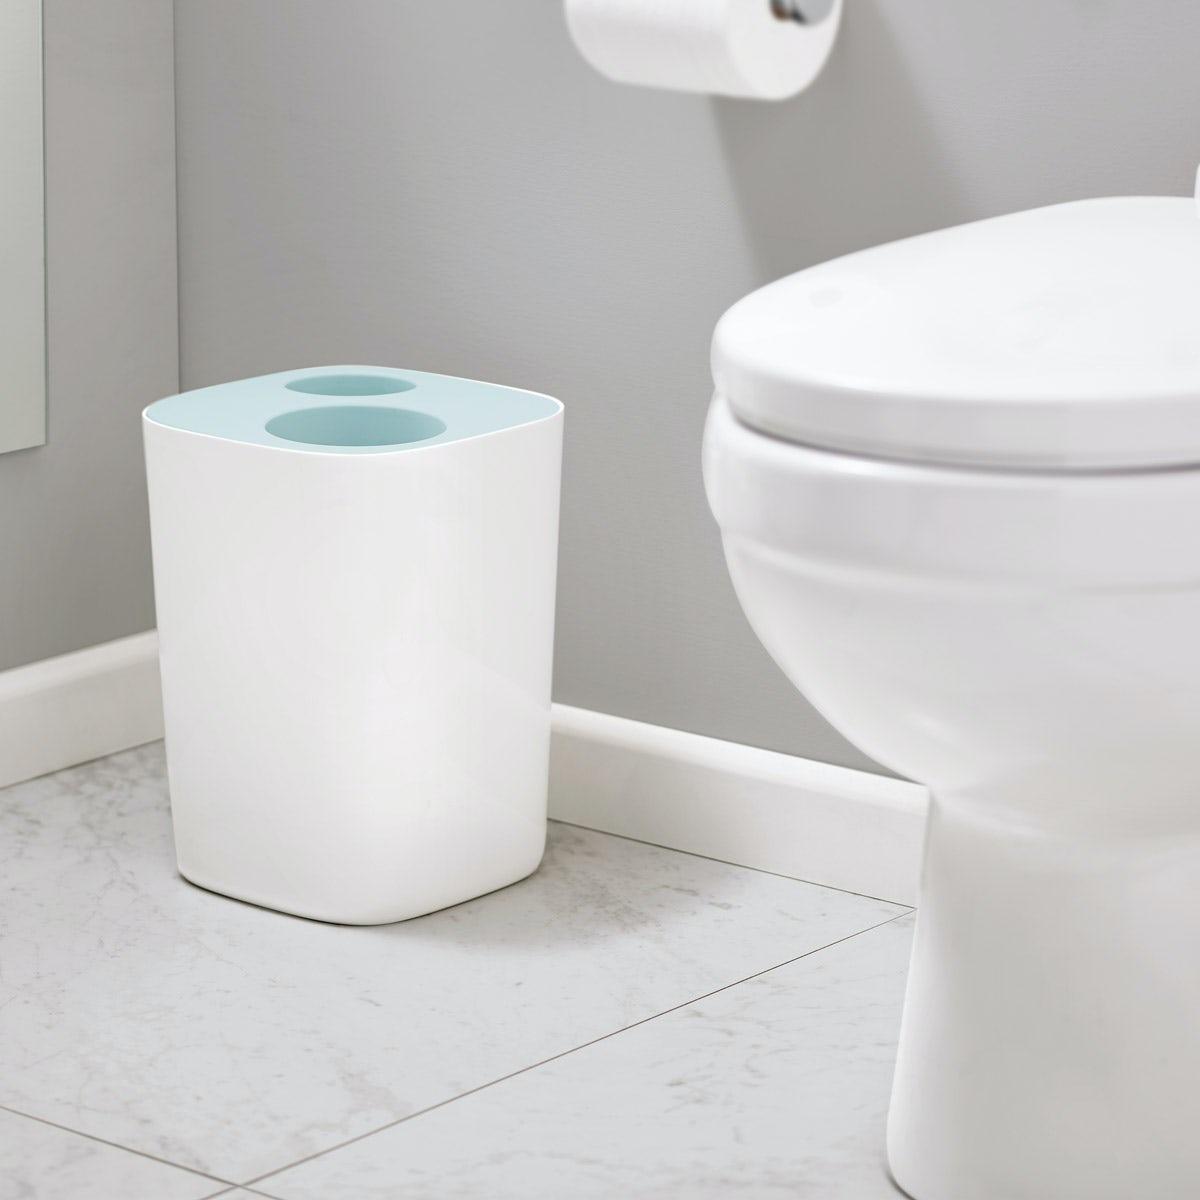 Joseph Joseph Split Bathroom Waste Separation Bin Victoriaplum Com